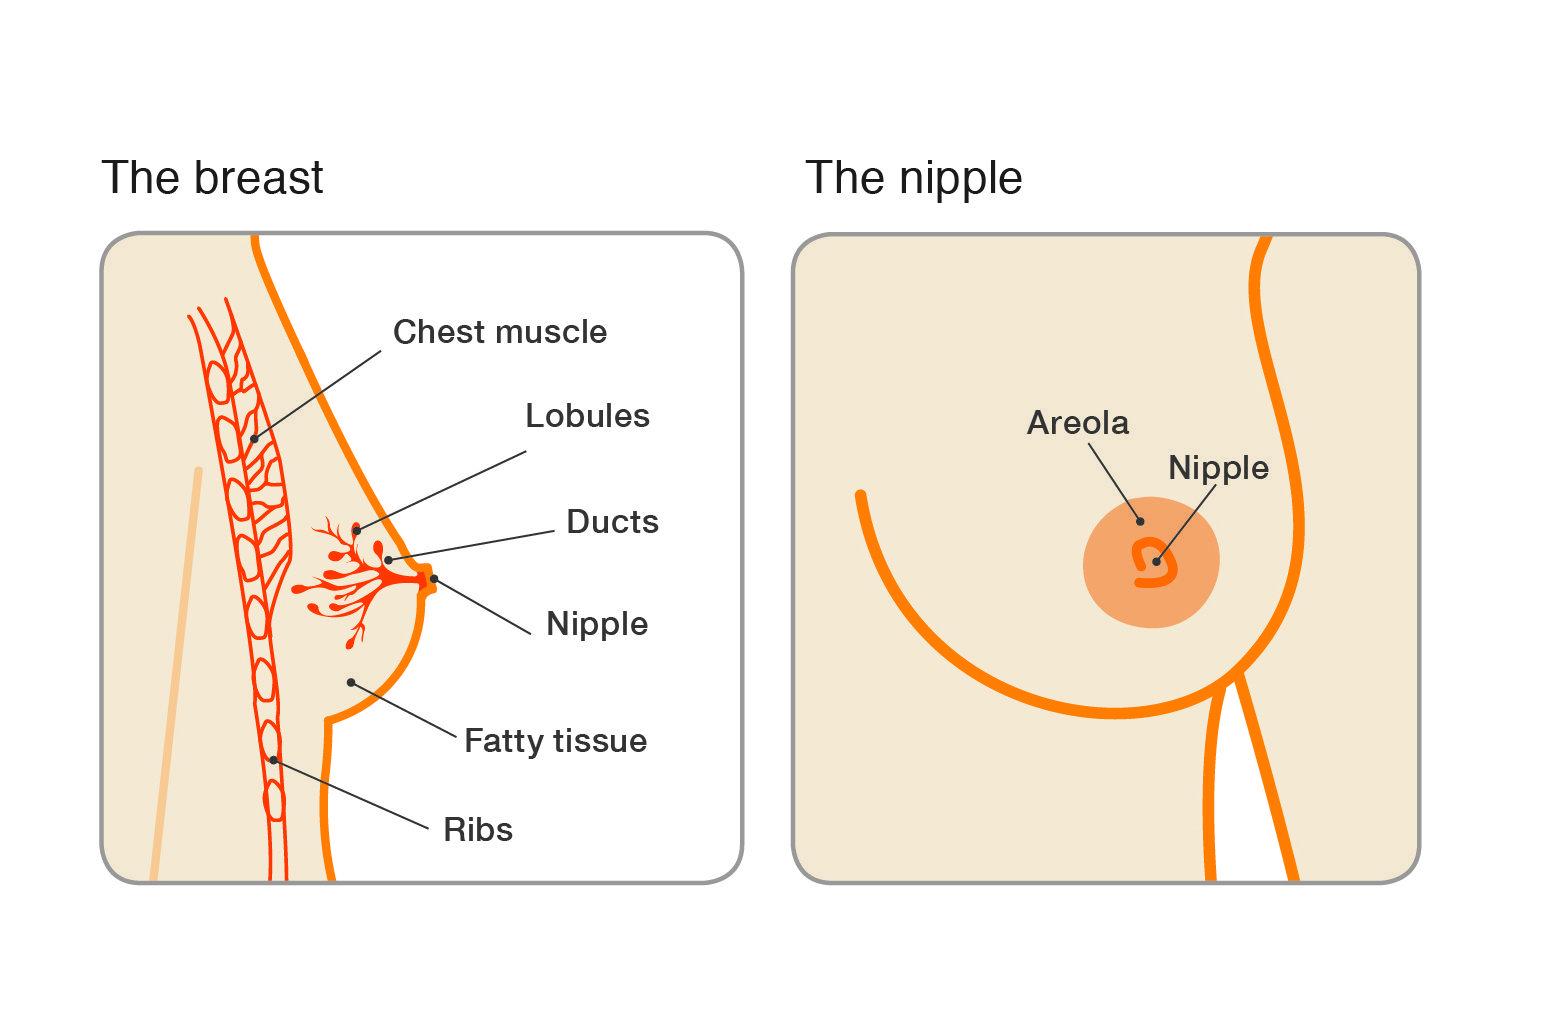 Best ultrasound images images in | Ultrasound, Radiology, Ultrasound sonography